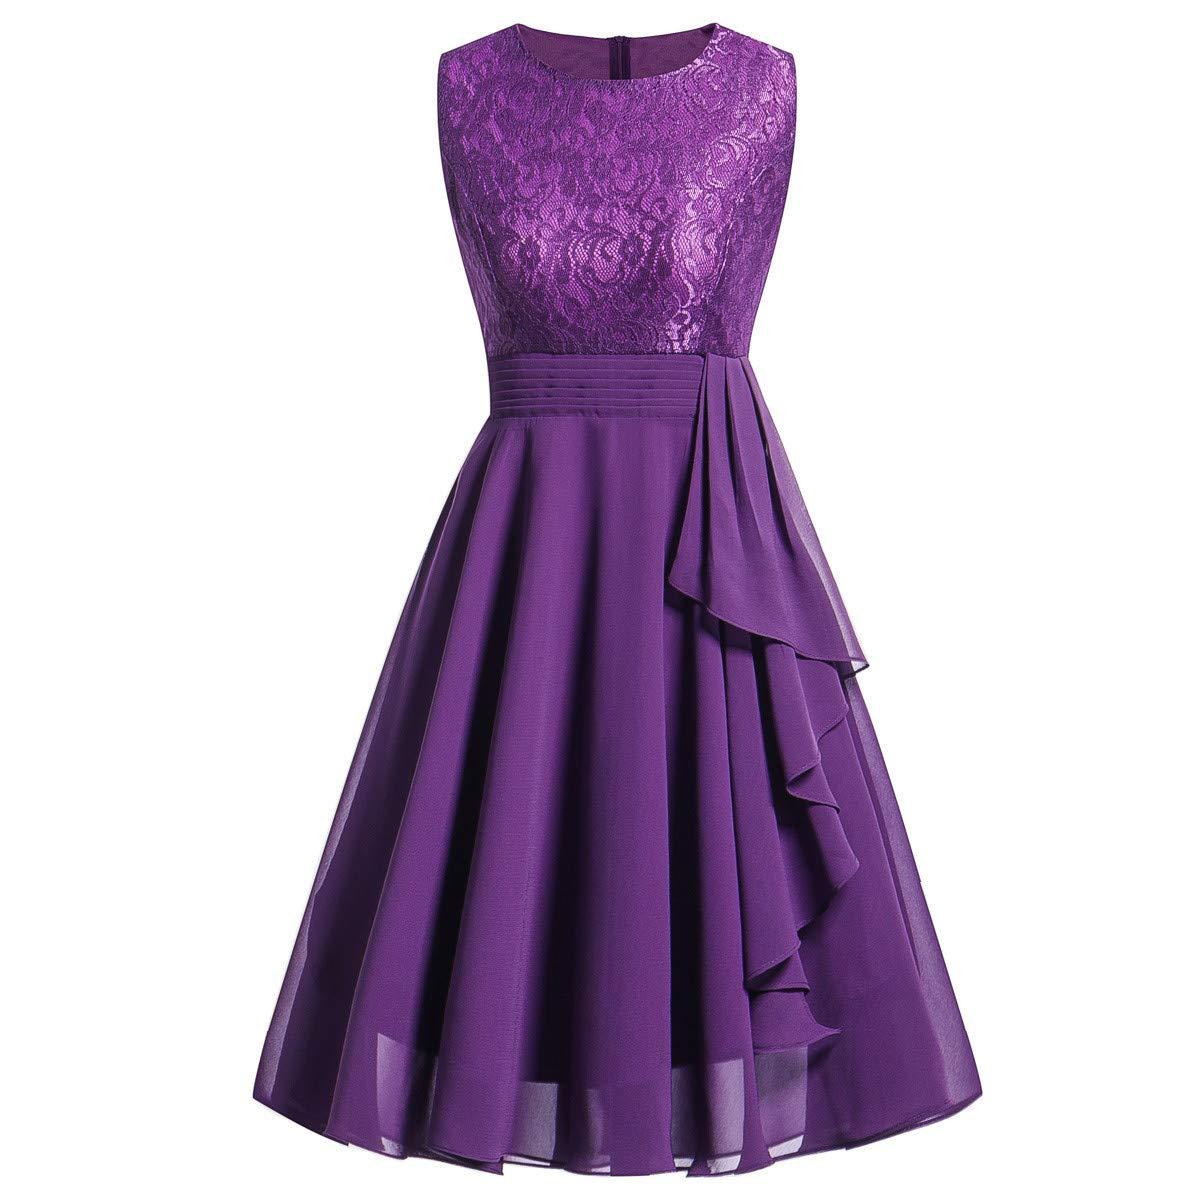 Women Cocktail Dress,Formal Lace Sleeveless Wedding Bridesmaid Short Mini Dress Han Shi(Purple,M)